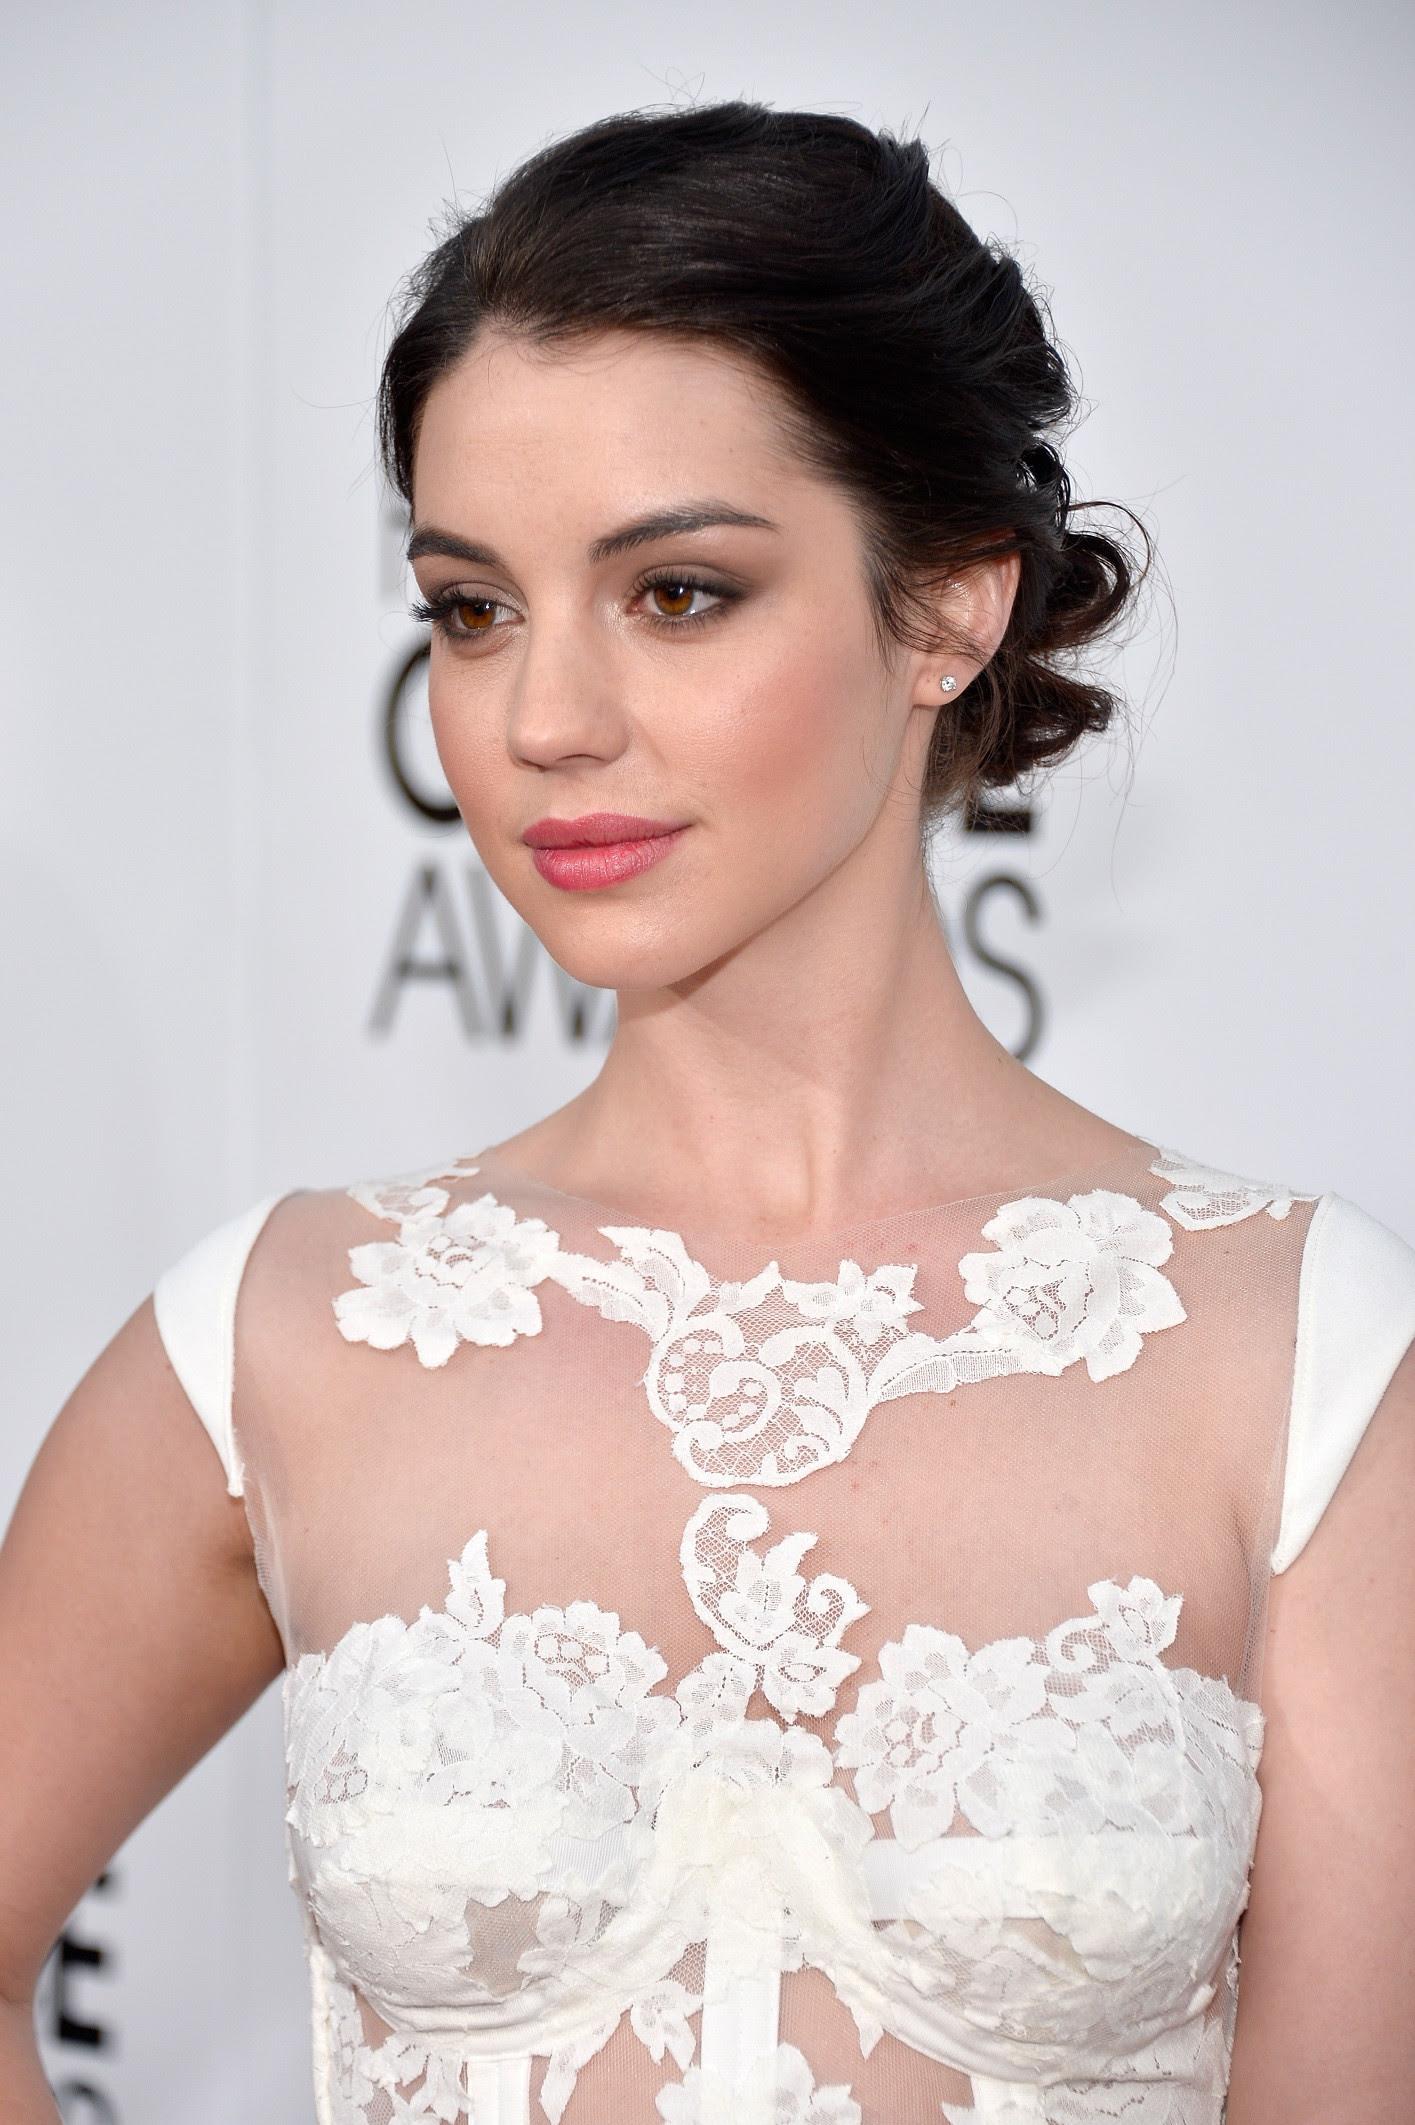 quot ADELAIDE KANE quot Luks Amazing In Skimpy White Dress